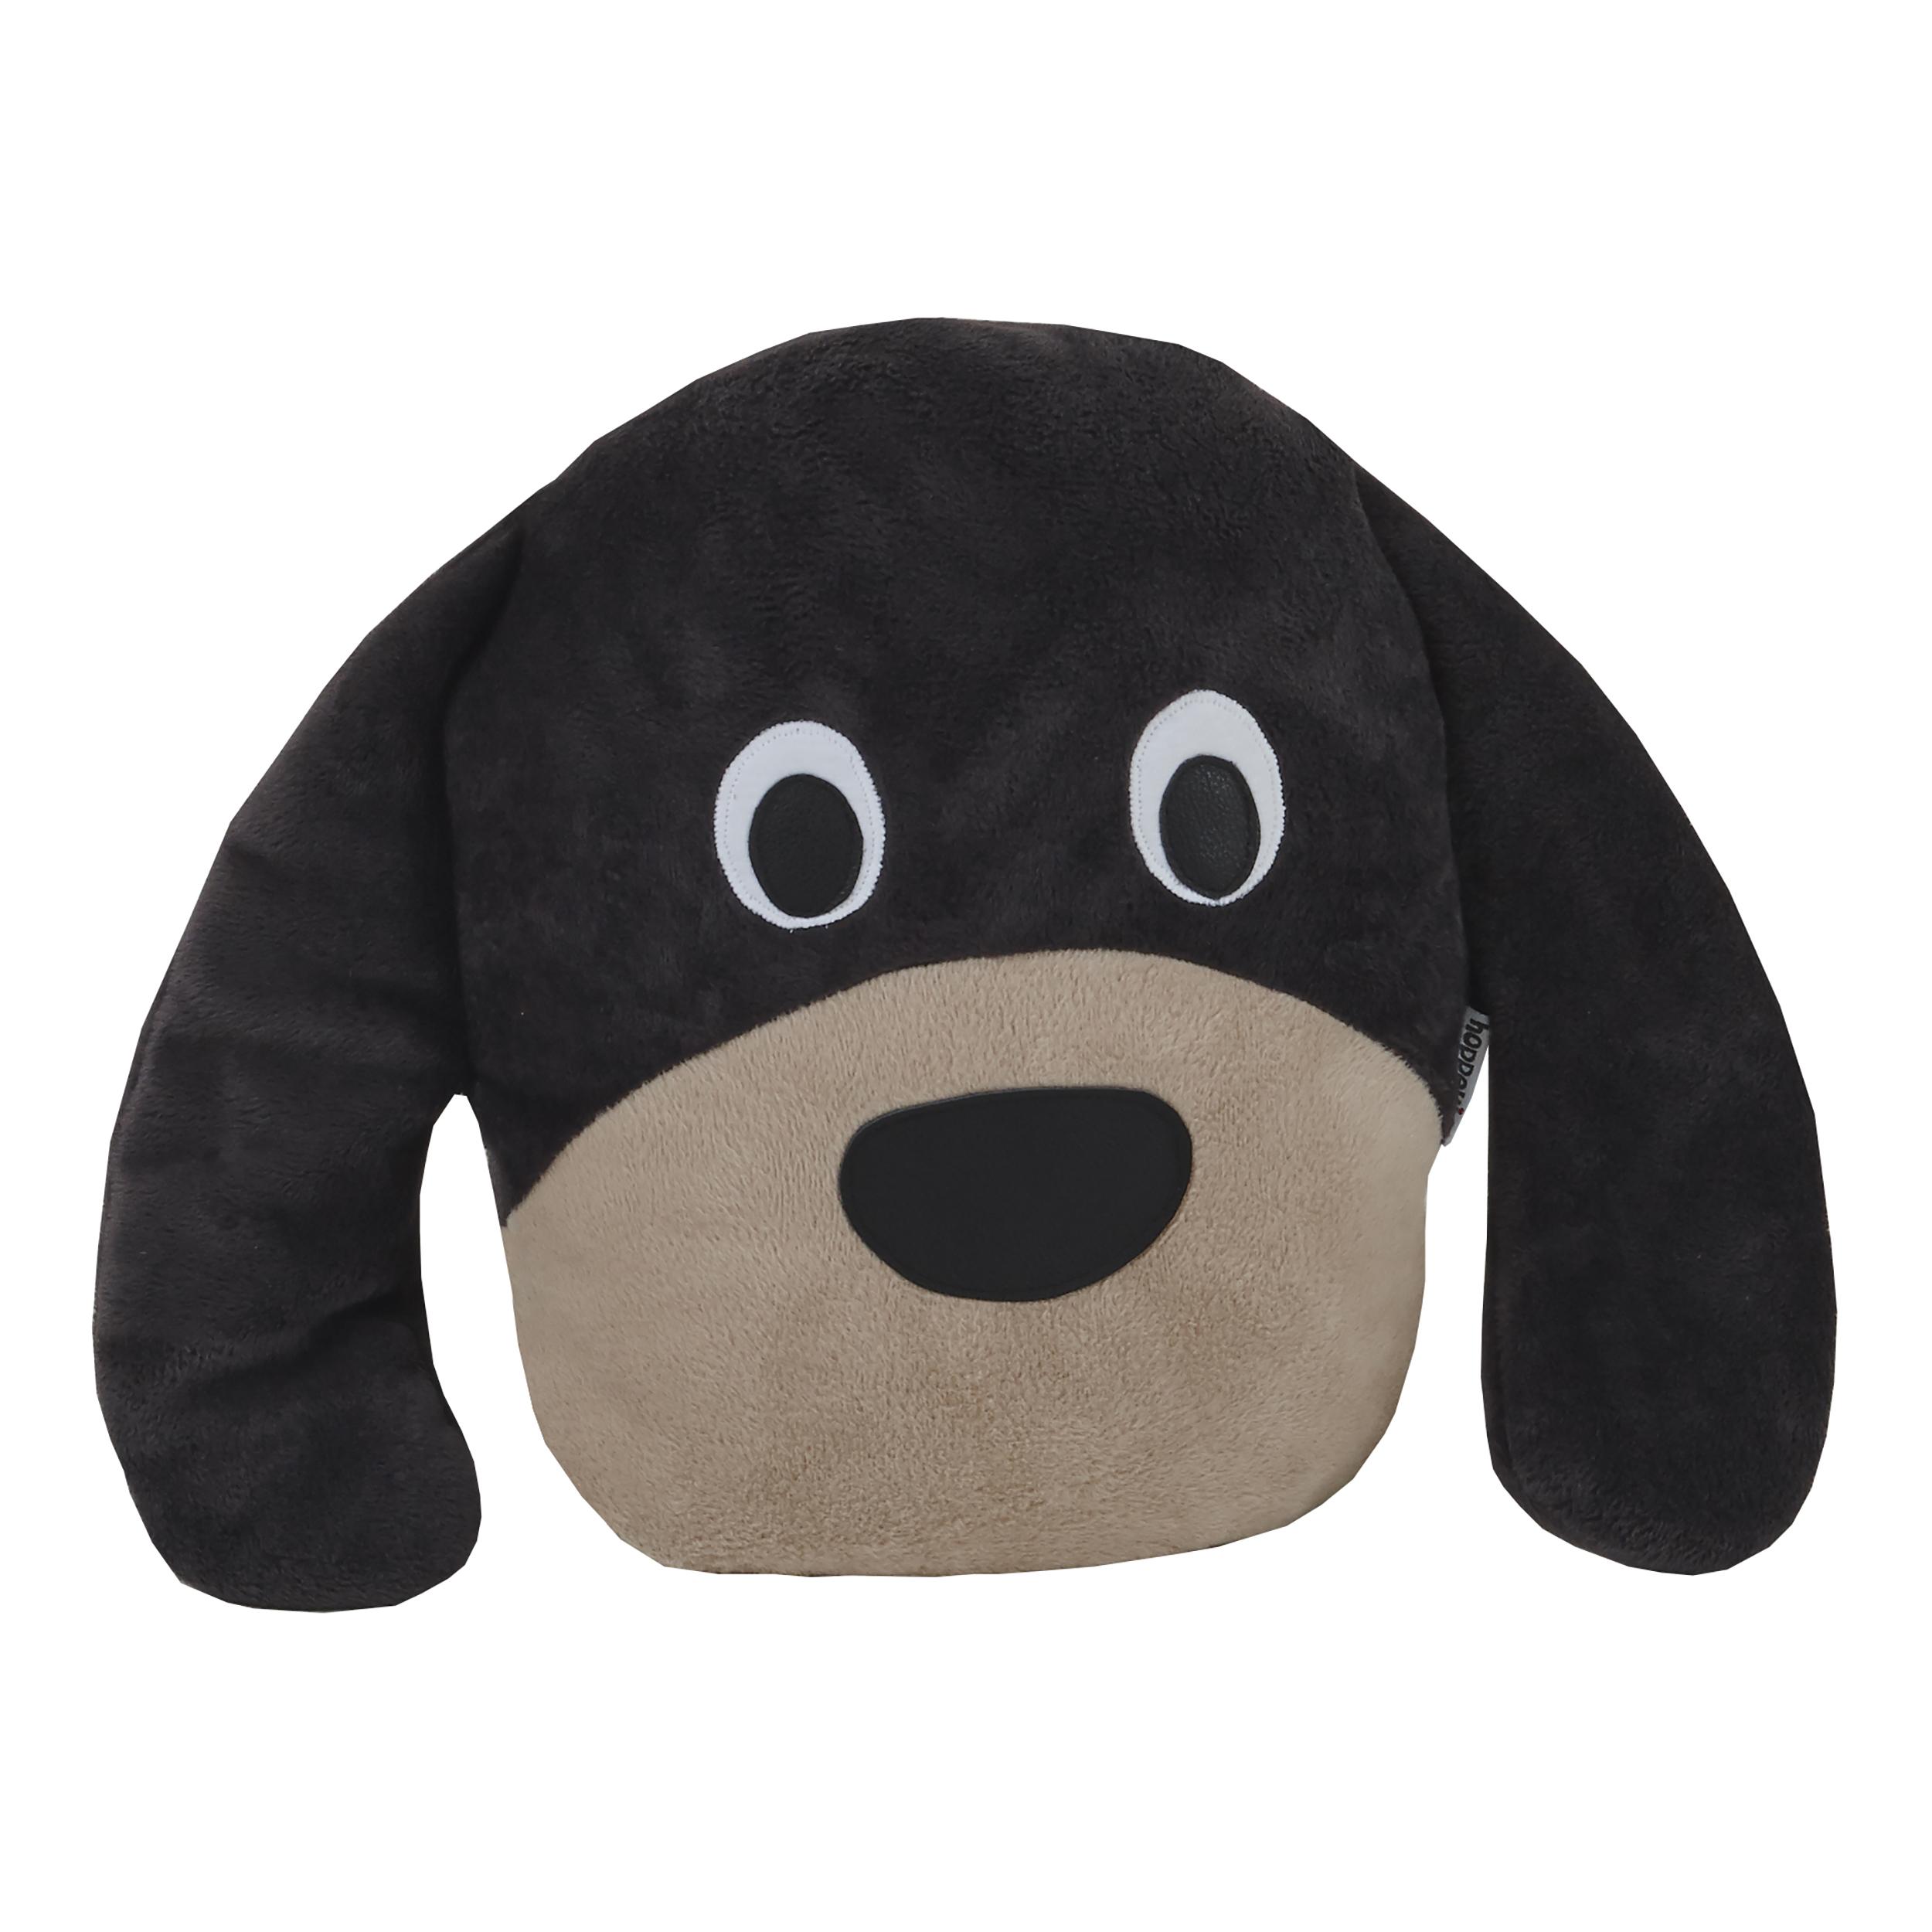 Hoppekids - Pets Cushion - Dog